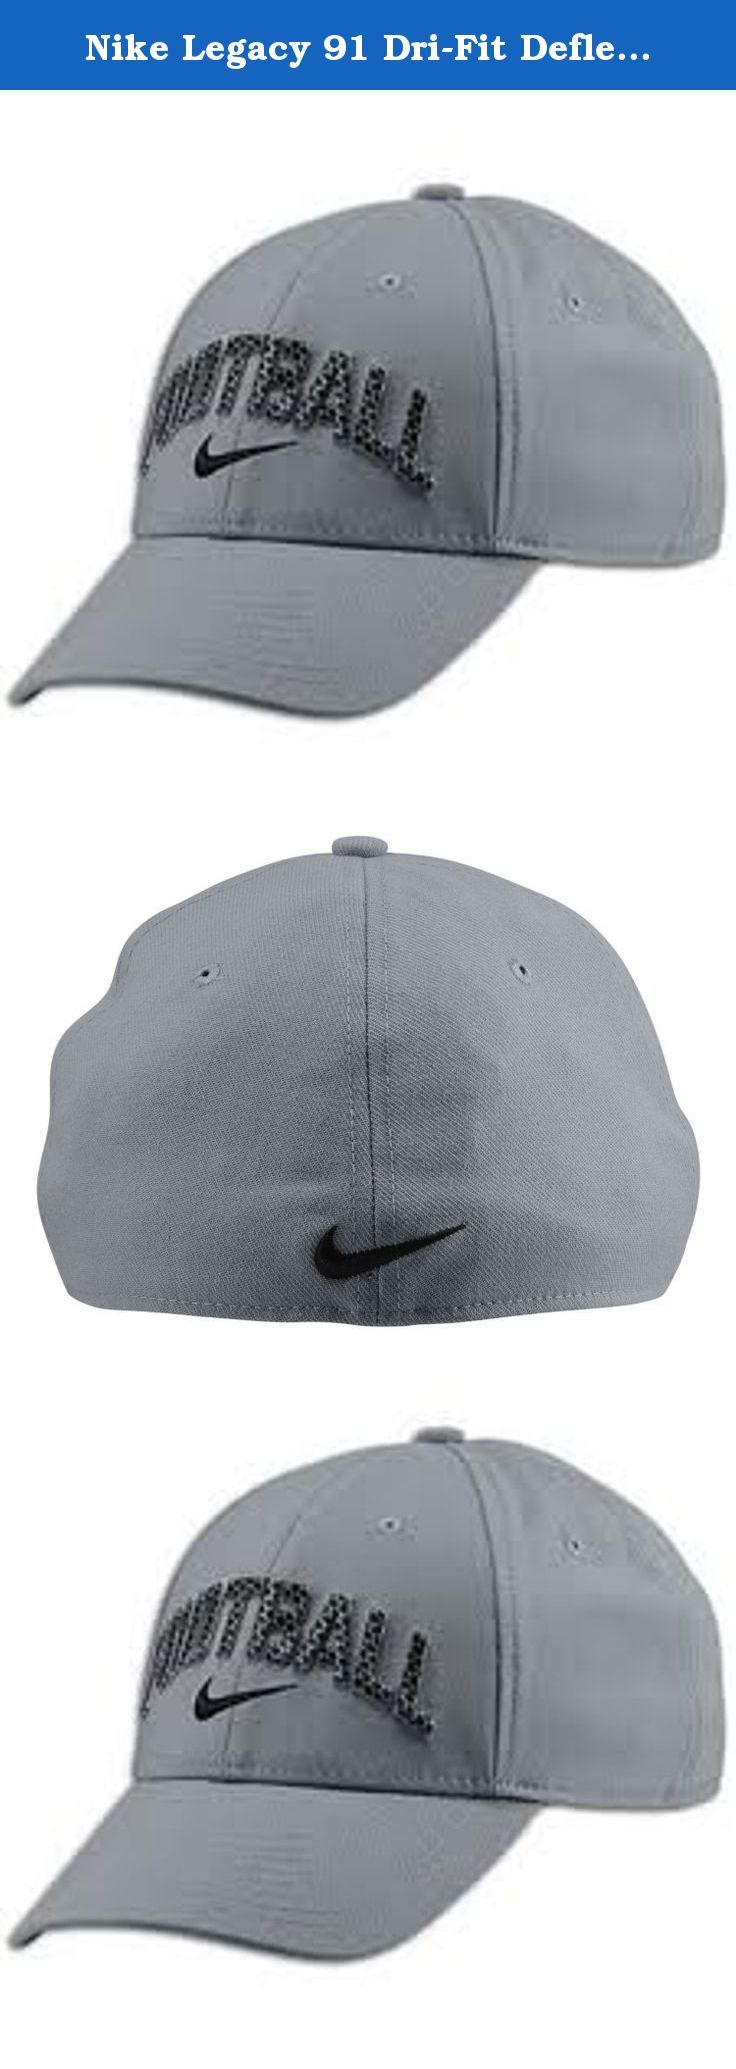 Nike Legacy 91 Dri-Fit Deflex Football Cap Gray Misc. Color GraySize Misc.